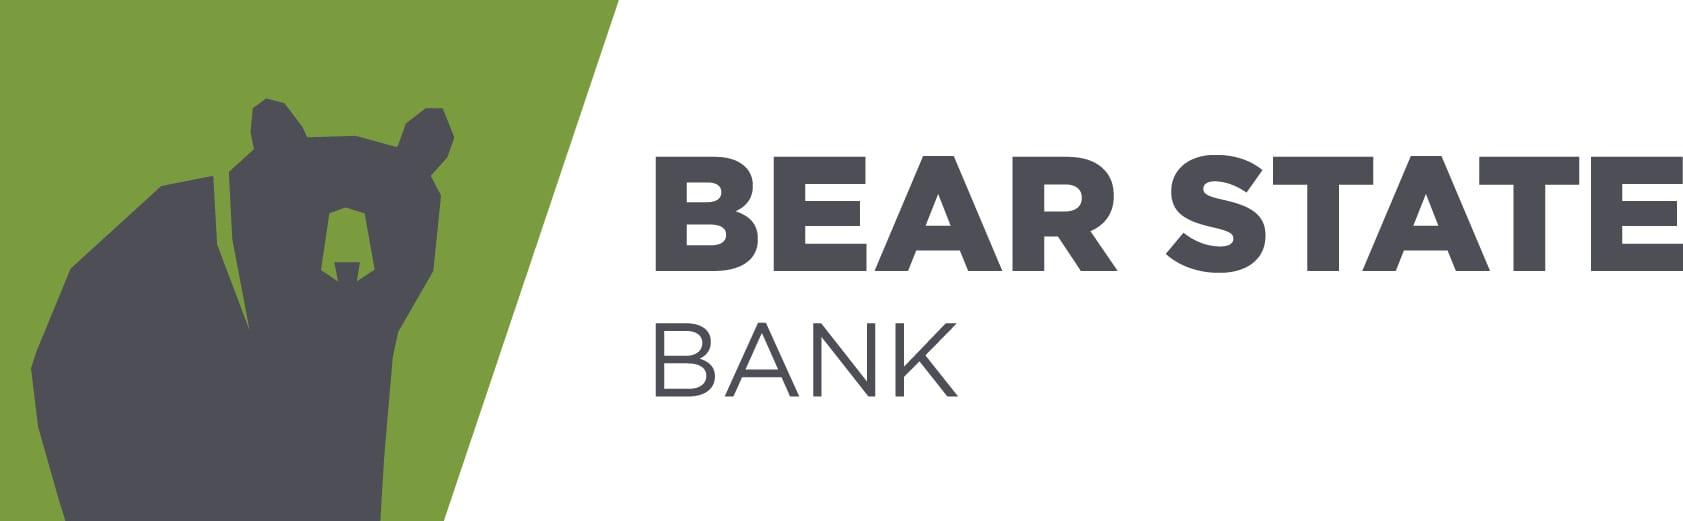 Bear State Bank